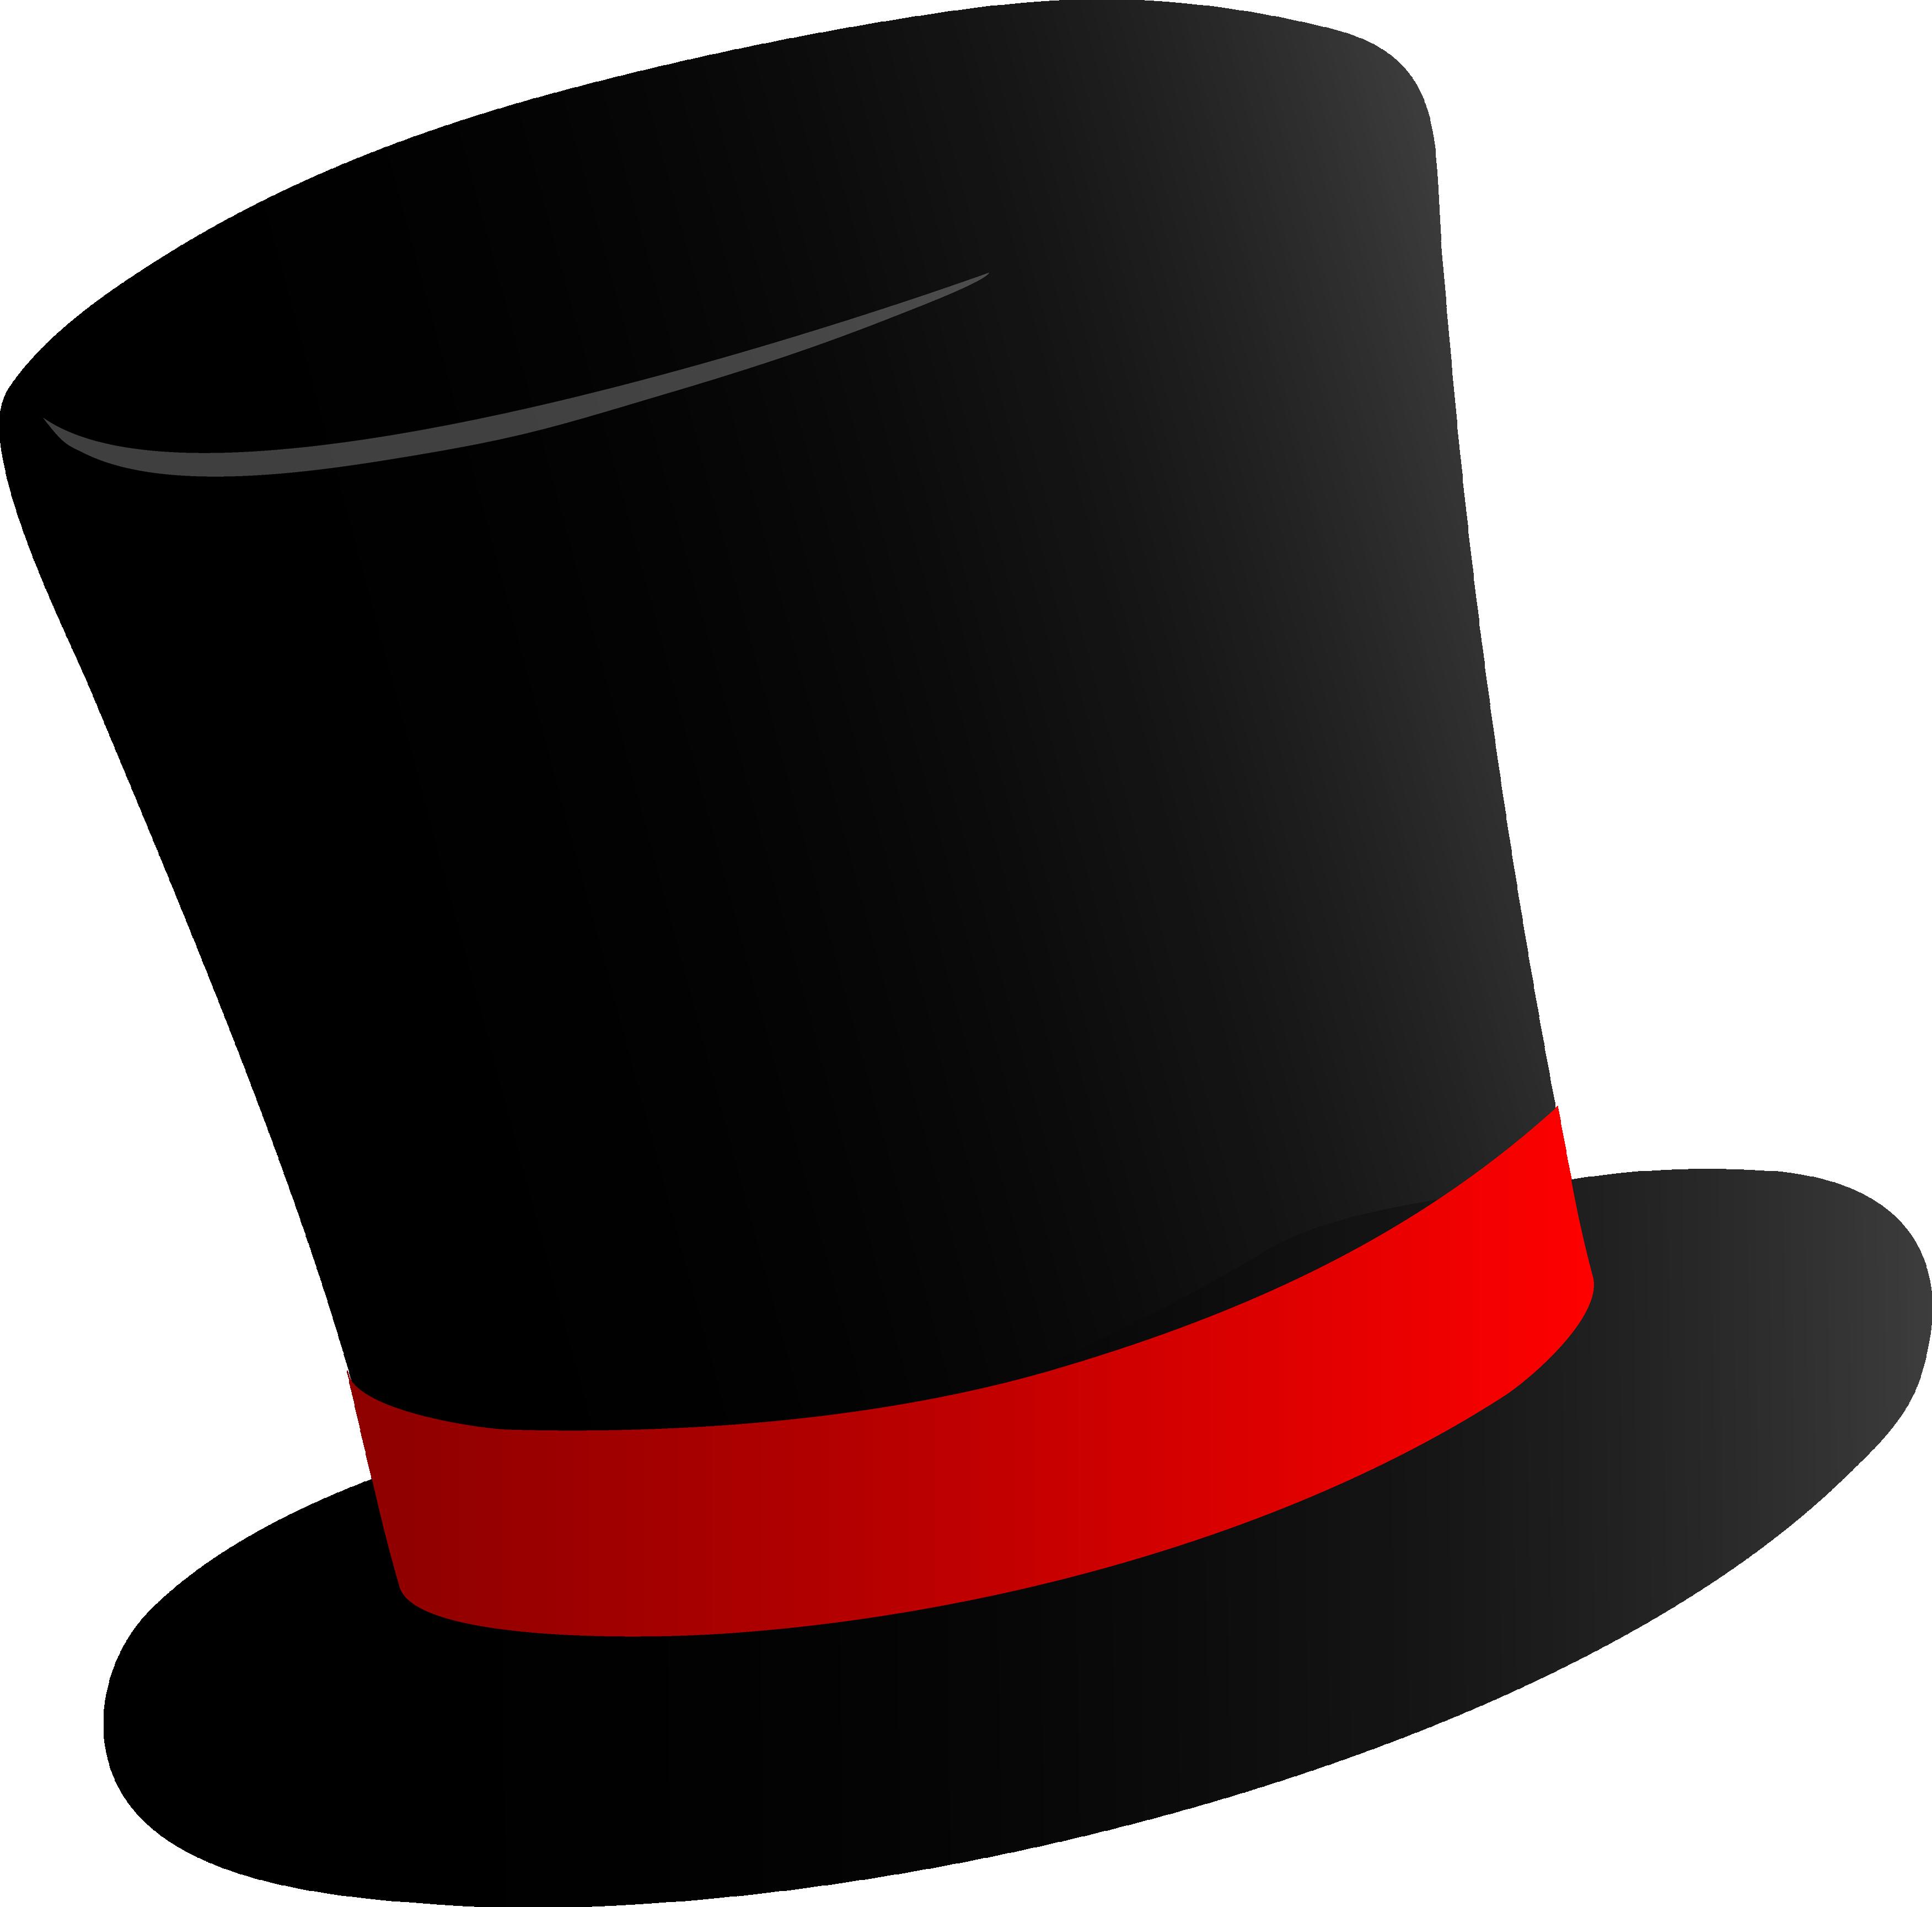 Black Top Hat PNG Image - PurePNG   Free transparent CC0 ...